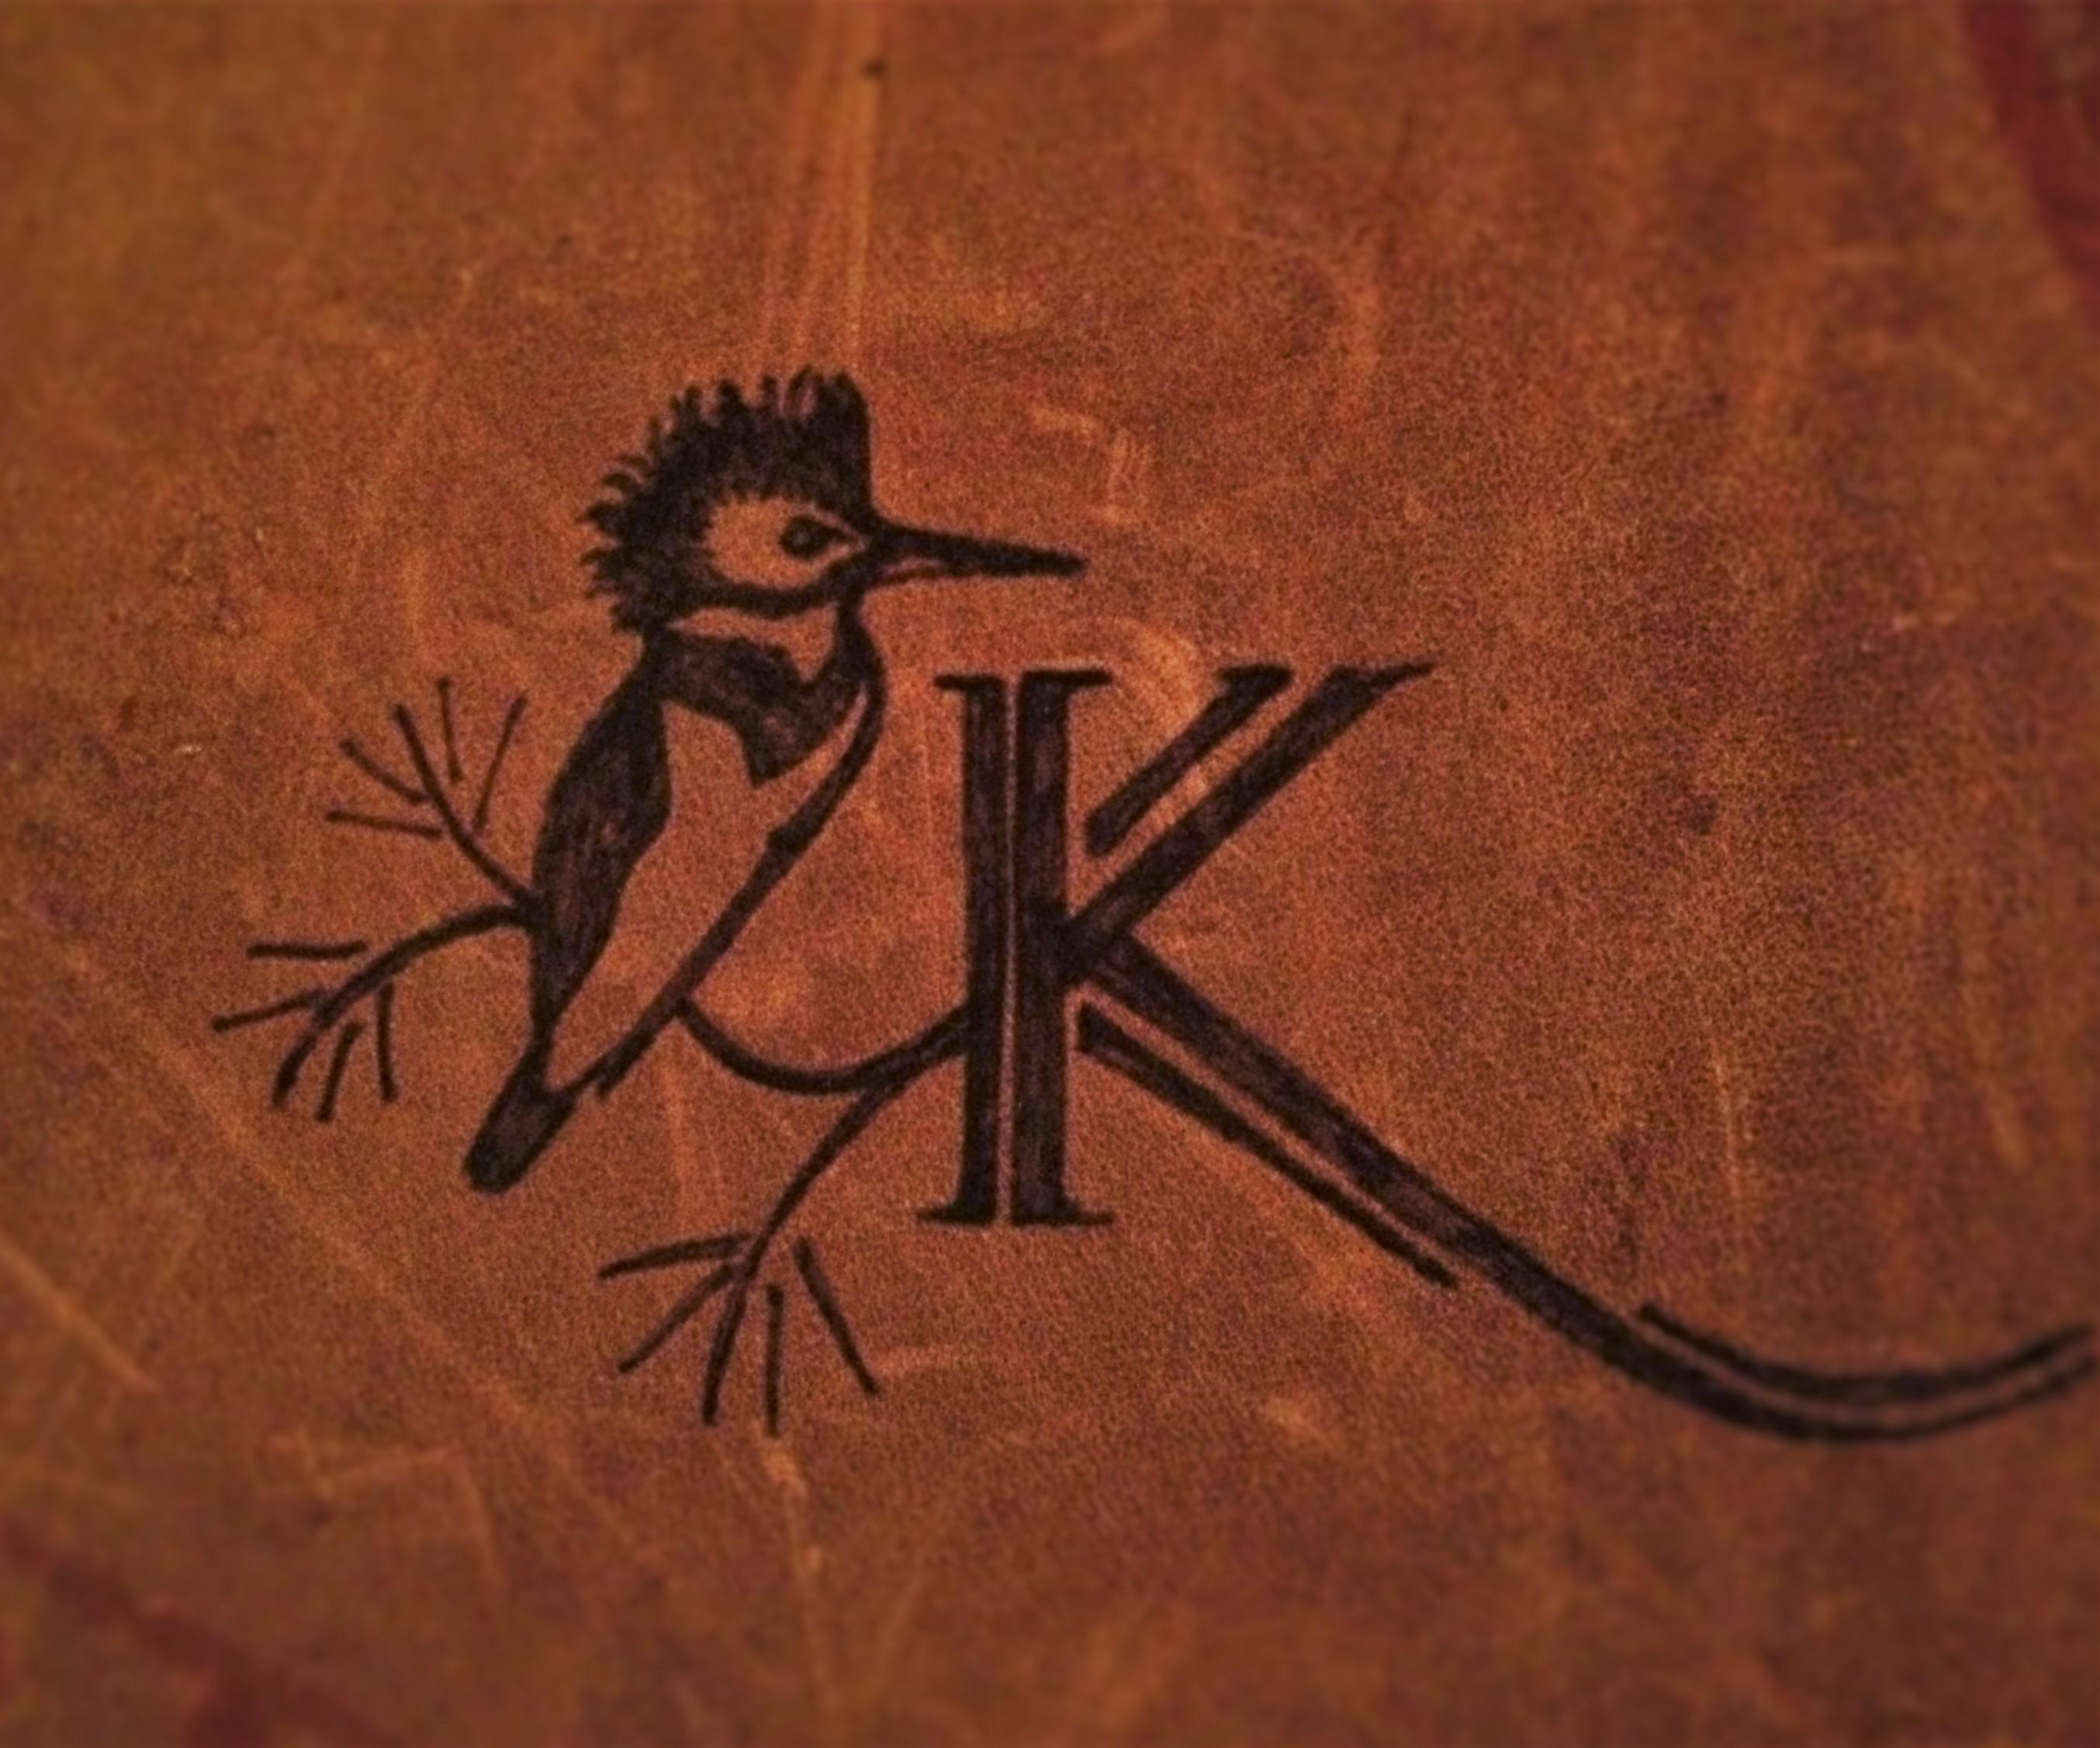 Kingfisher-Restaurant-Wine-List-cover-Sleeping-Lady-Resort-Leavenworth-WA-2.jpg